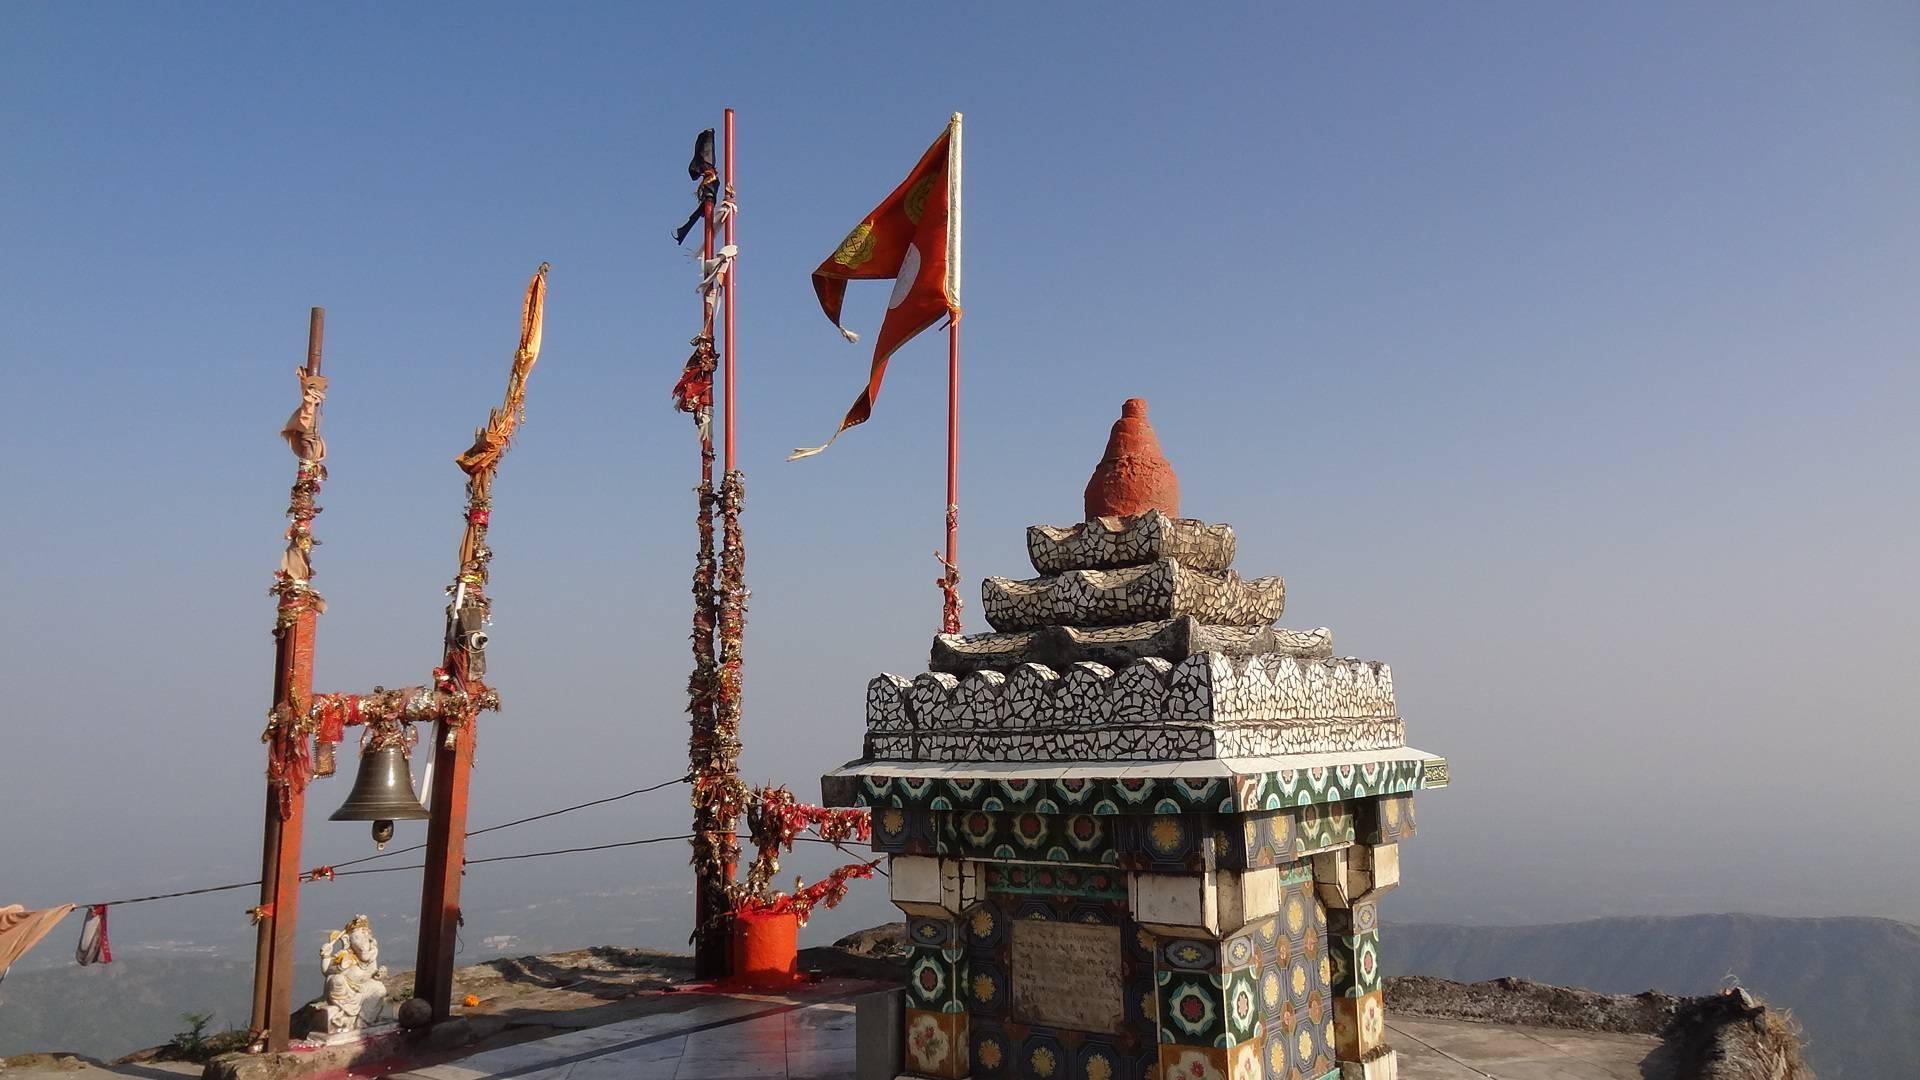 Photo 3: Un lieu de pèlerinage au Gujarat